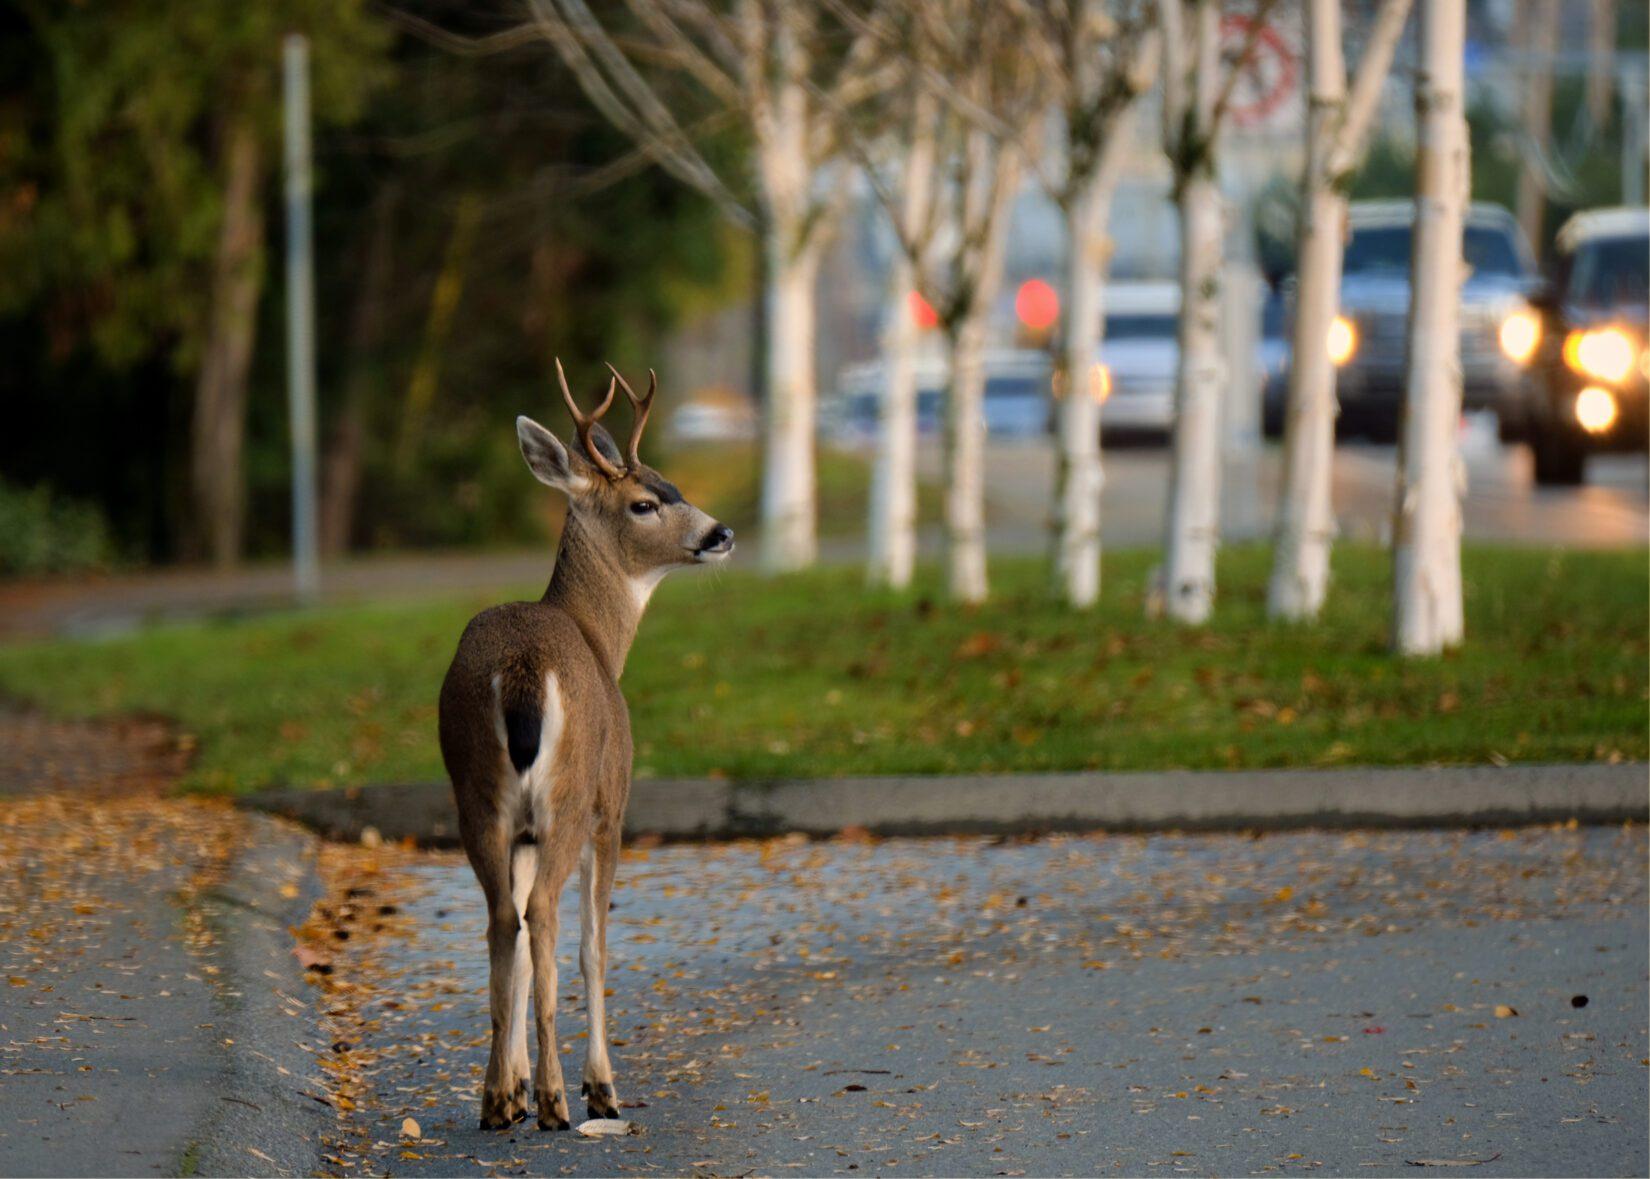 Young deer buck by roadside